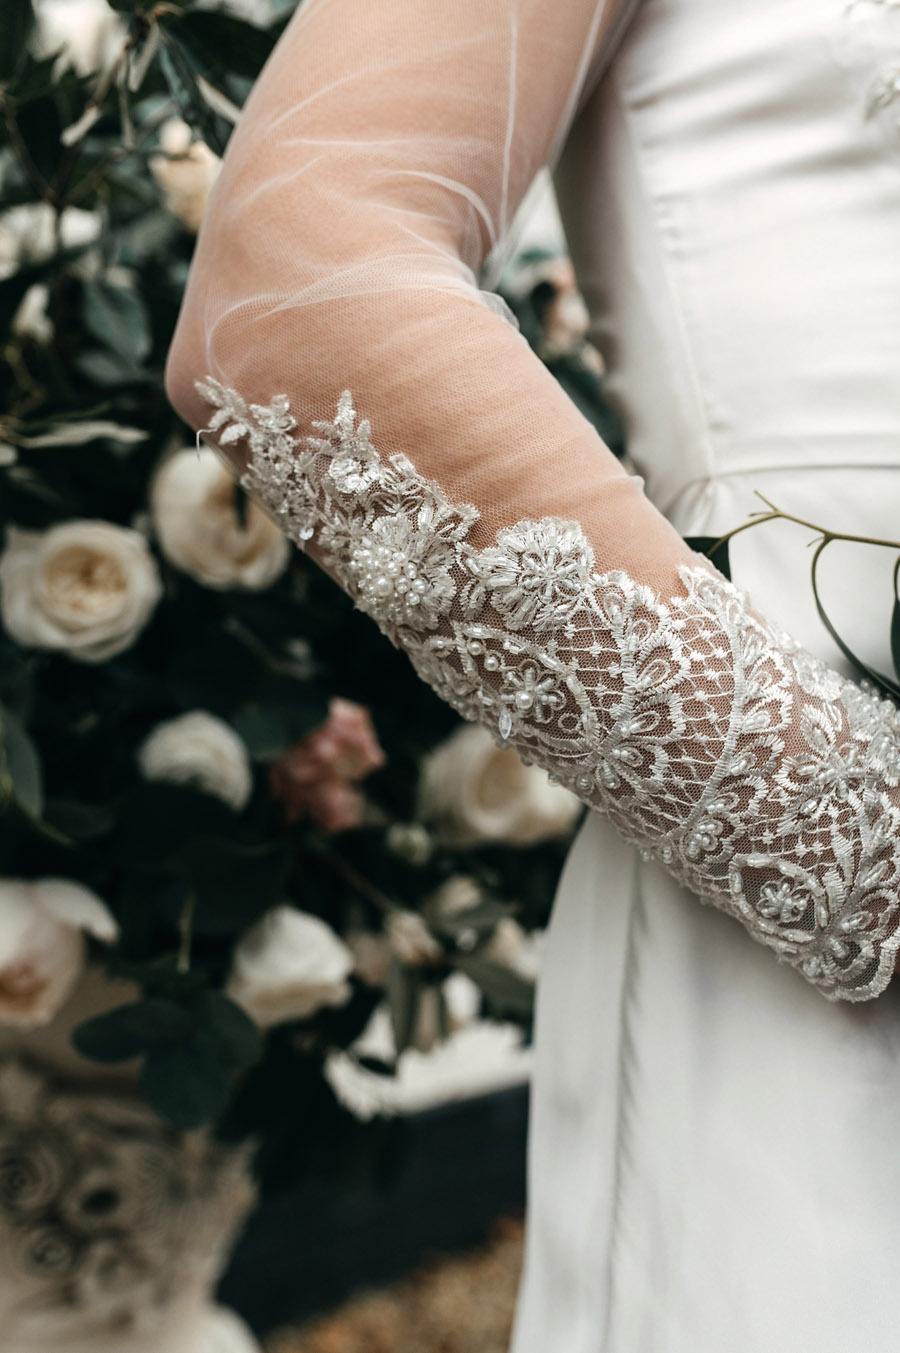 Eco vegan wedding style inspiration with Sanyukta Shrestha, credit KMGS Photography (30)